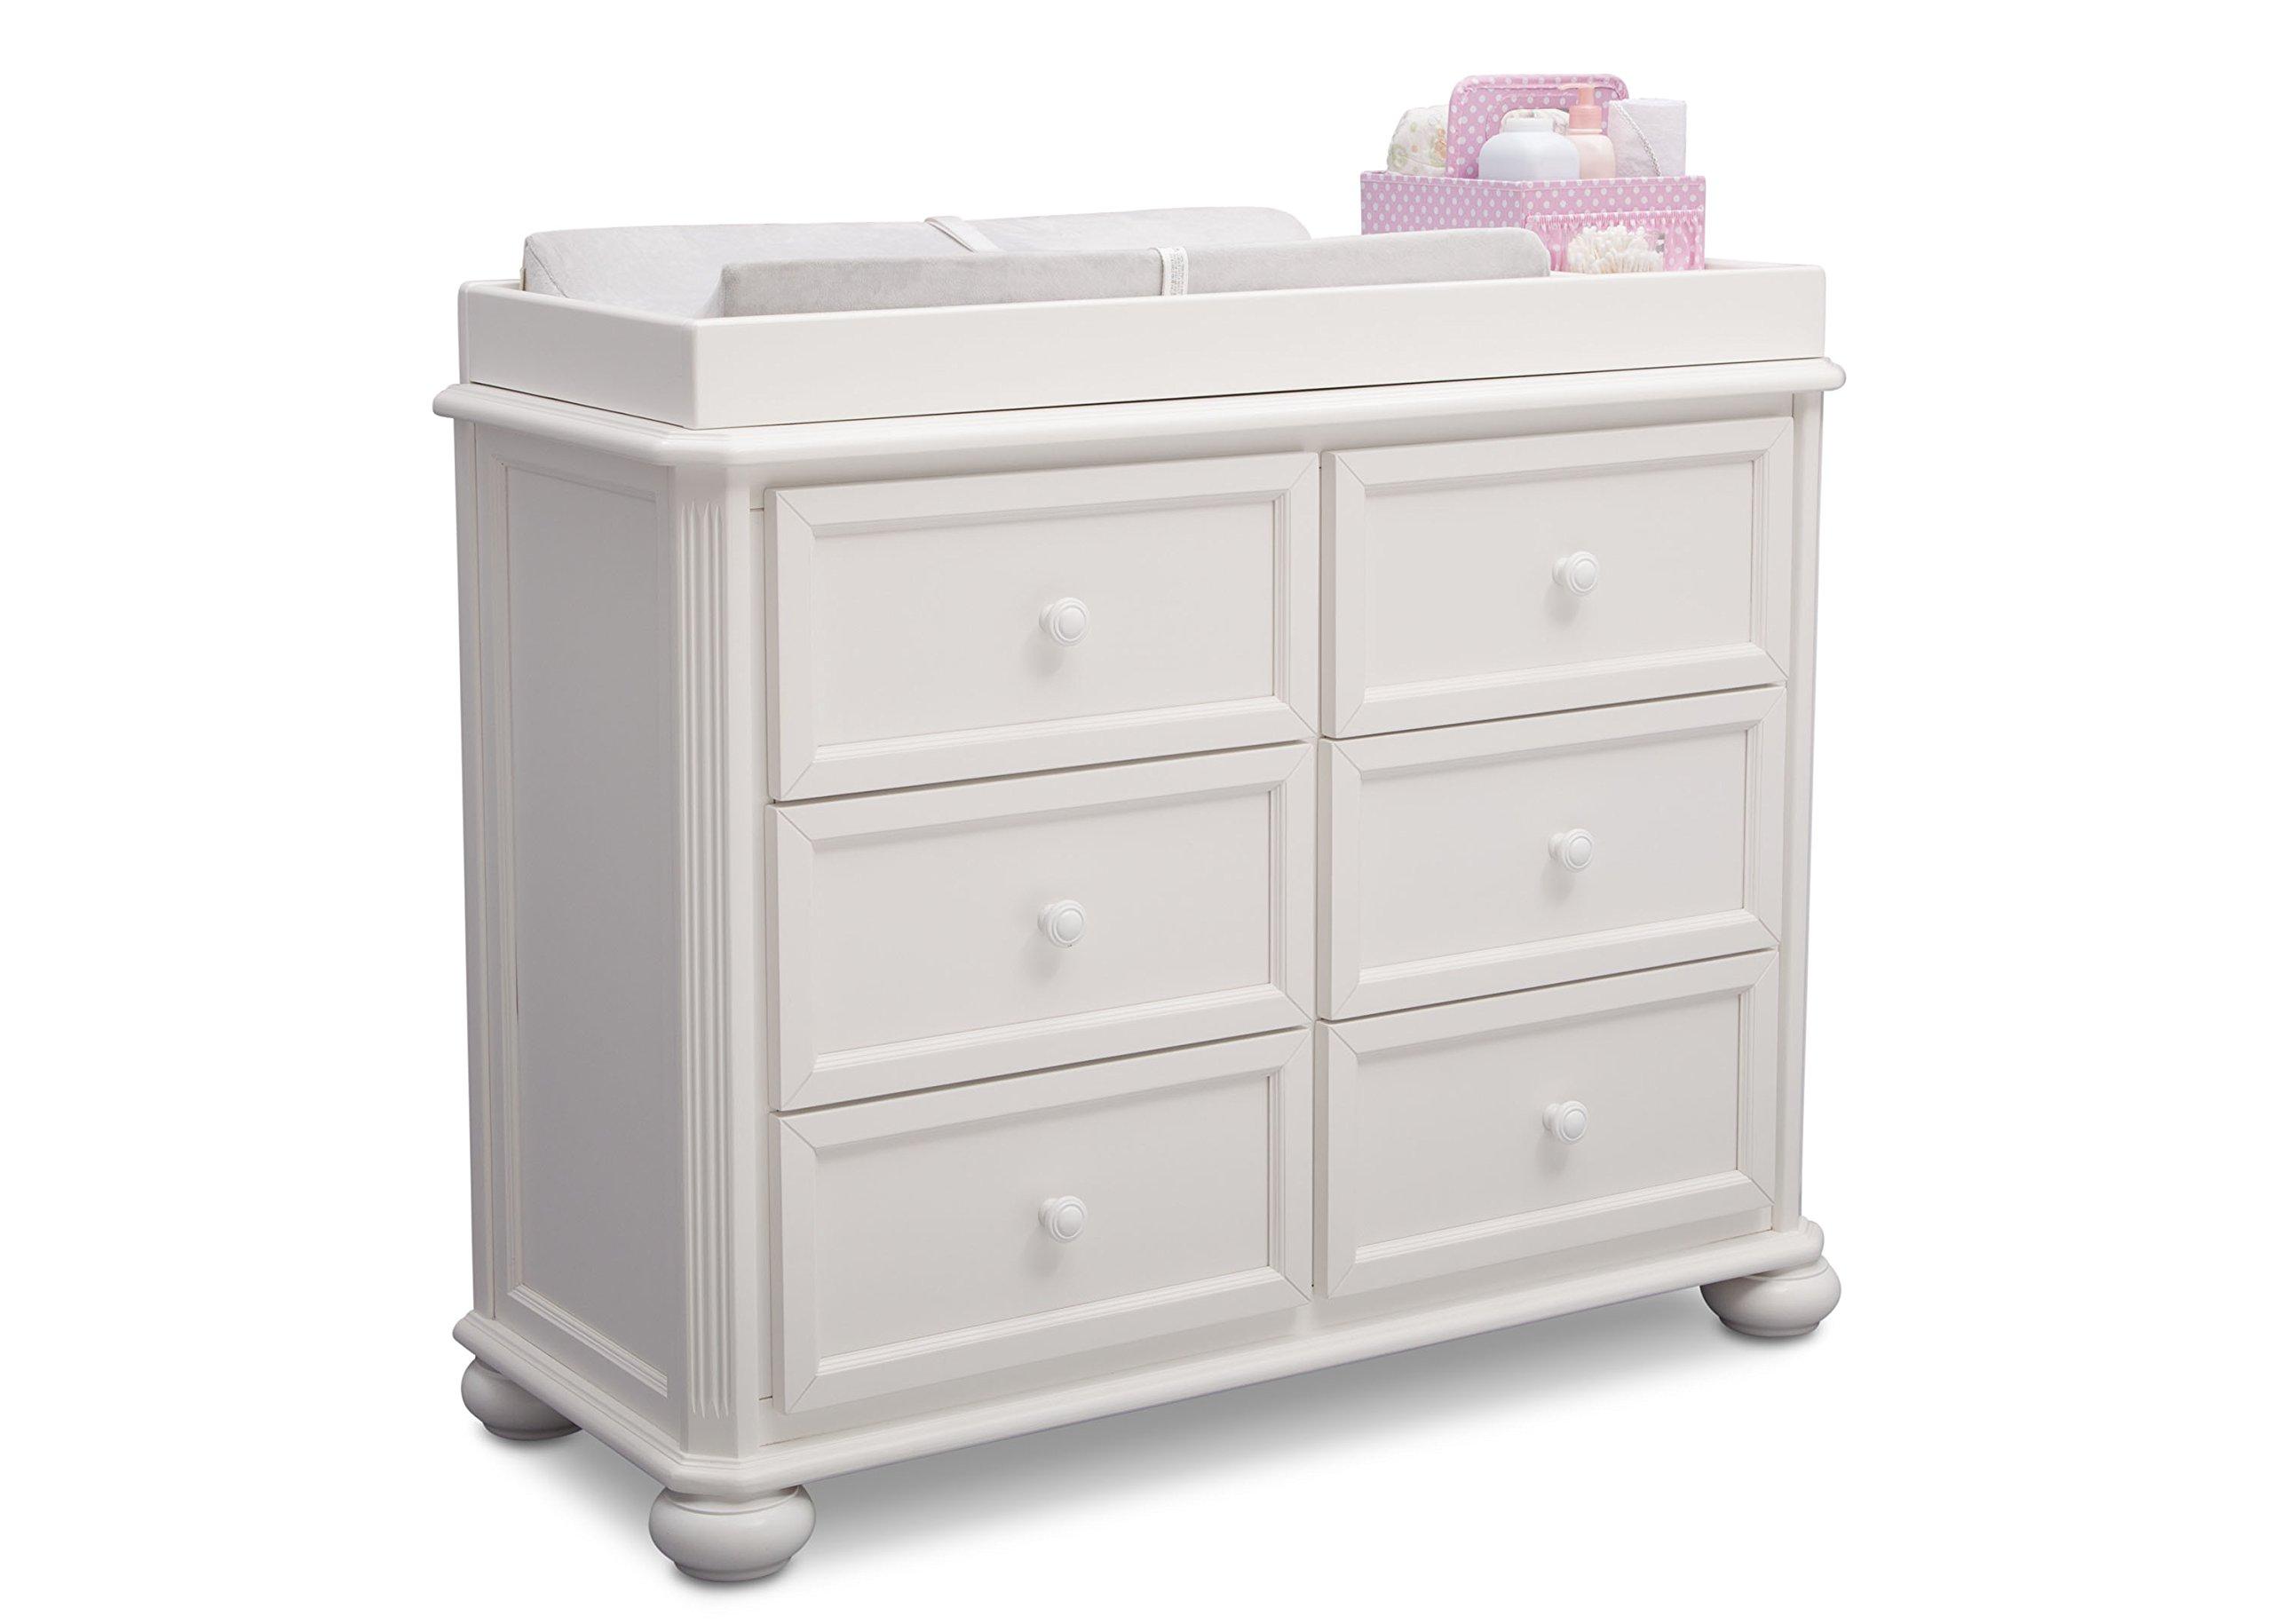 Simmons Kids Peyton 6-Piece Nursery Furniture Set (Convertible Crib, Dresser, Chest, Changing Top, Toddler Guardrail, Full Size Conversion), Bianca White by Delta Children (Image #5)